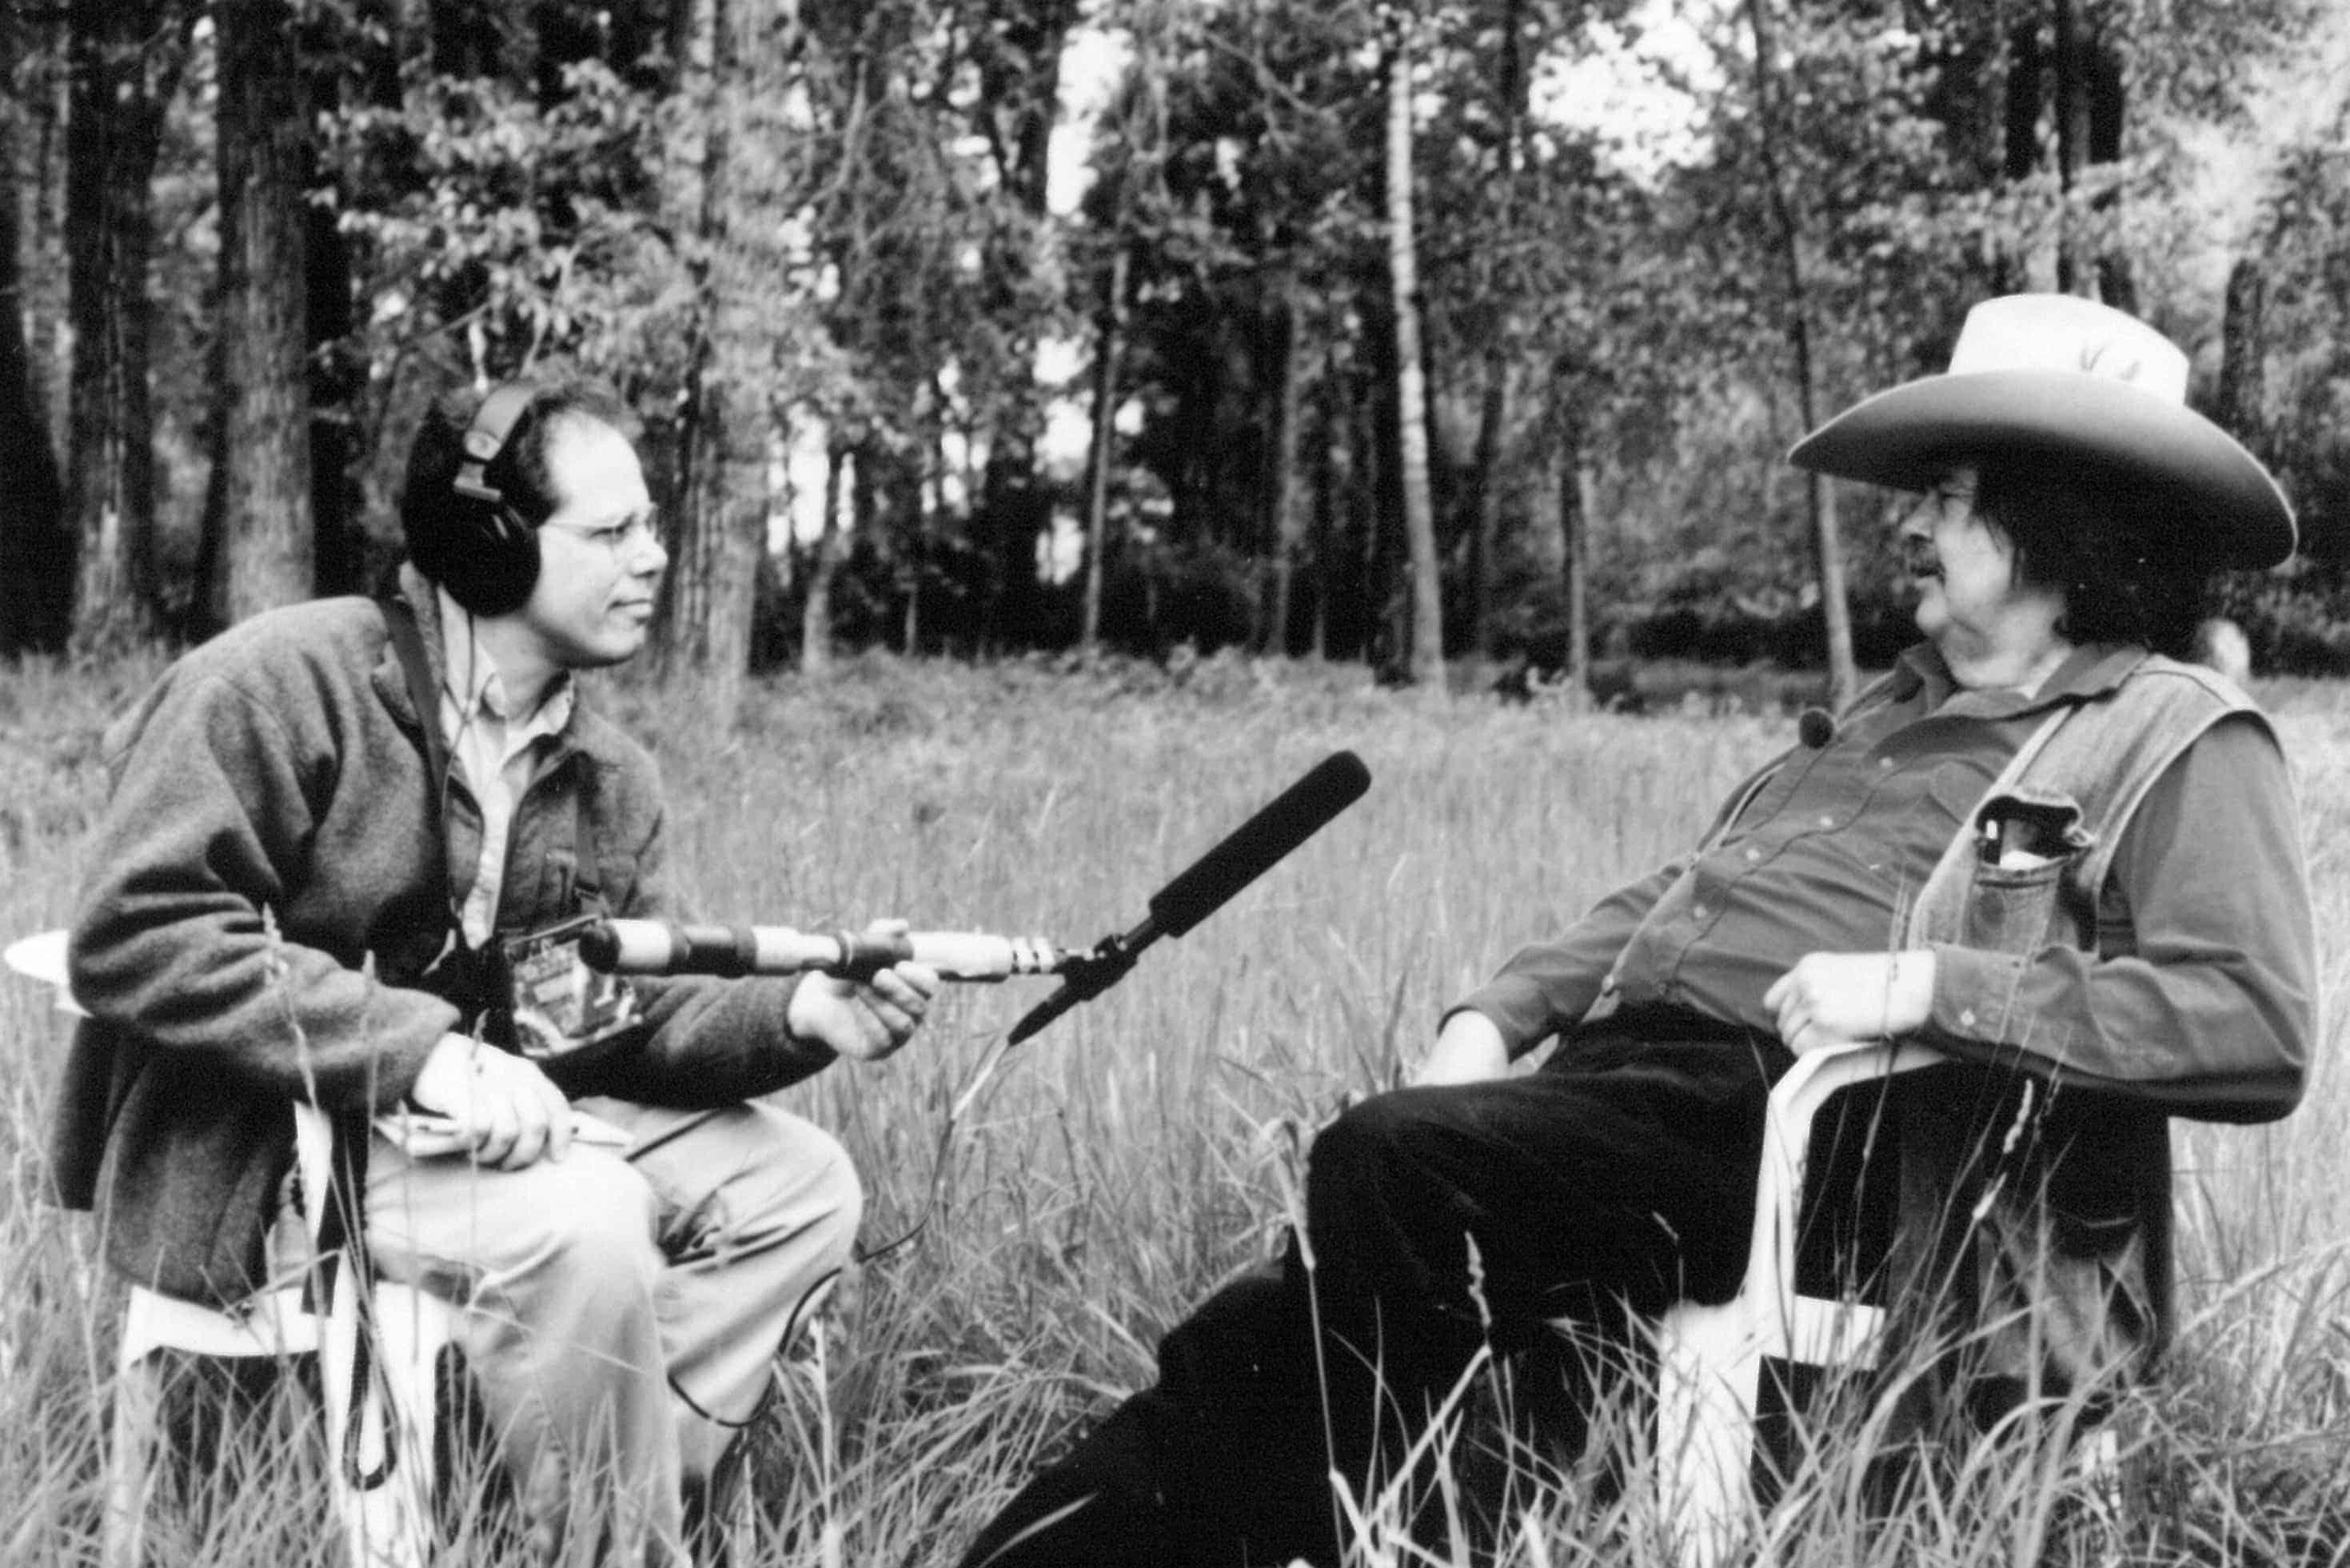 berkes_holden-interview_1997